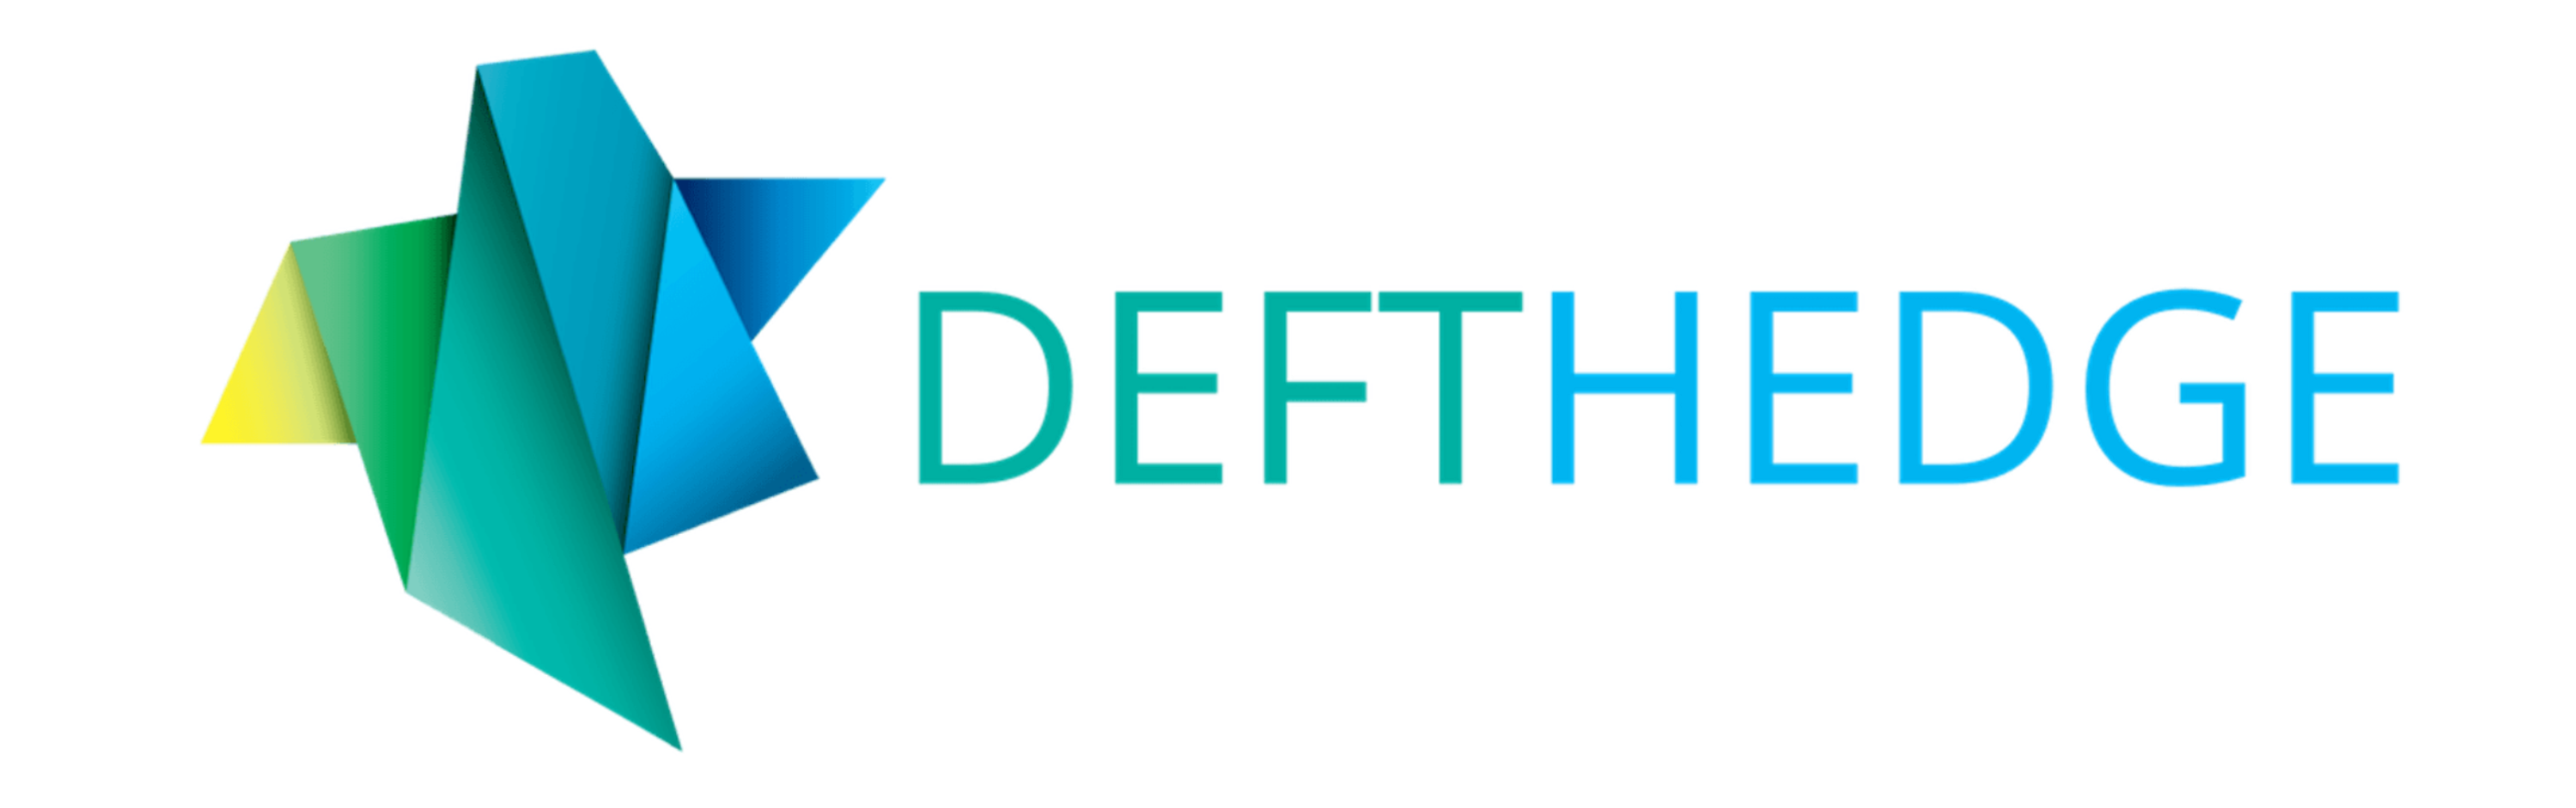 DeftHedge